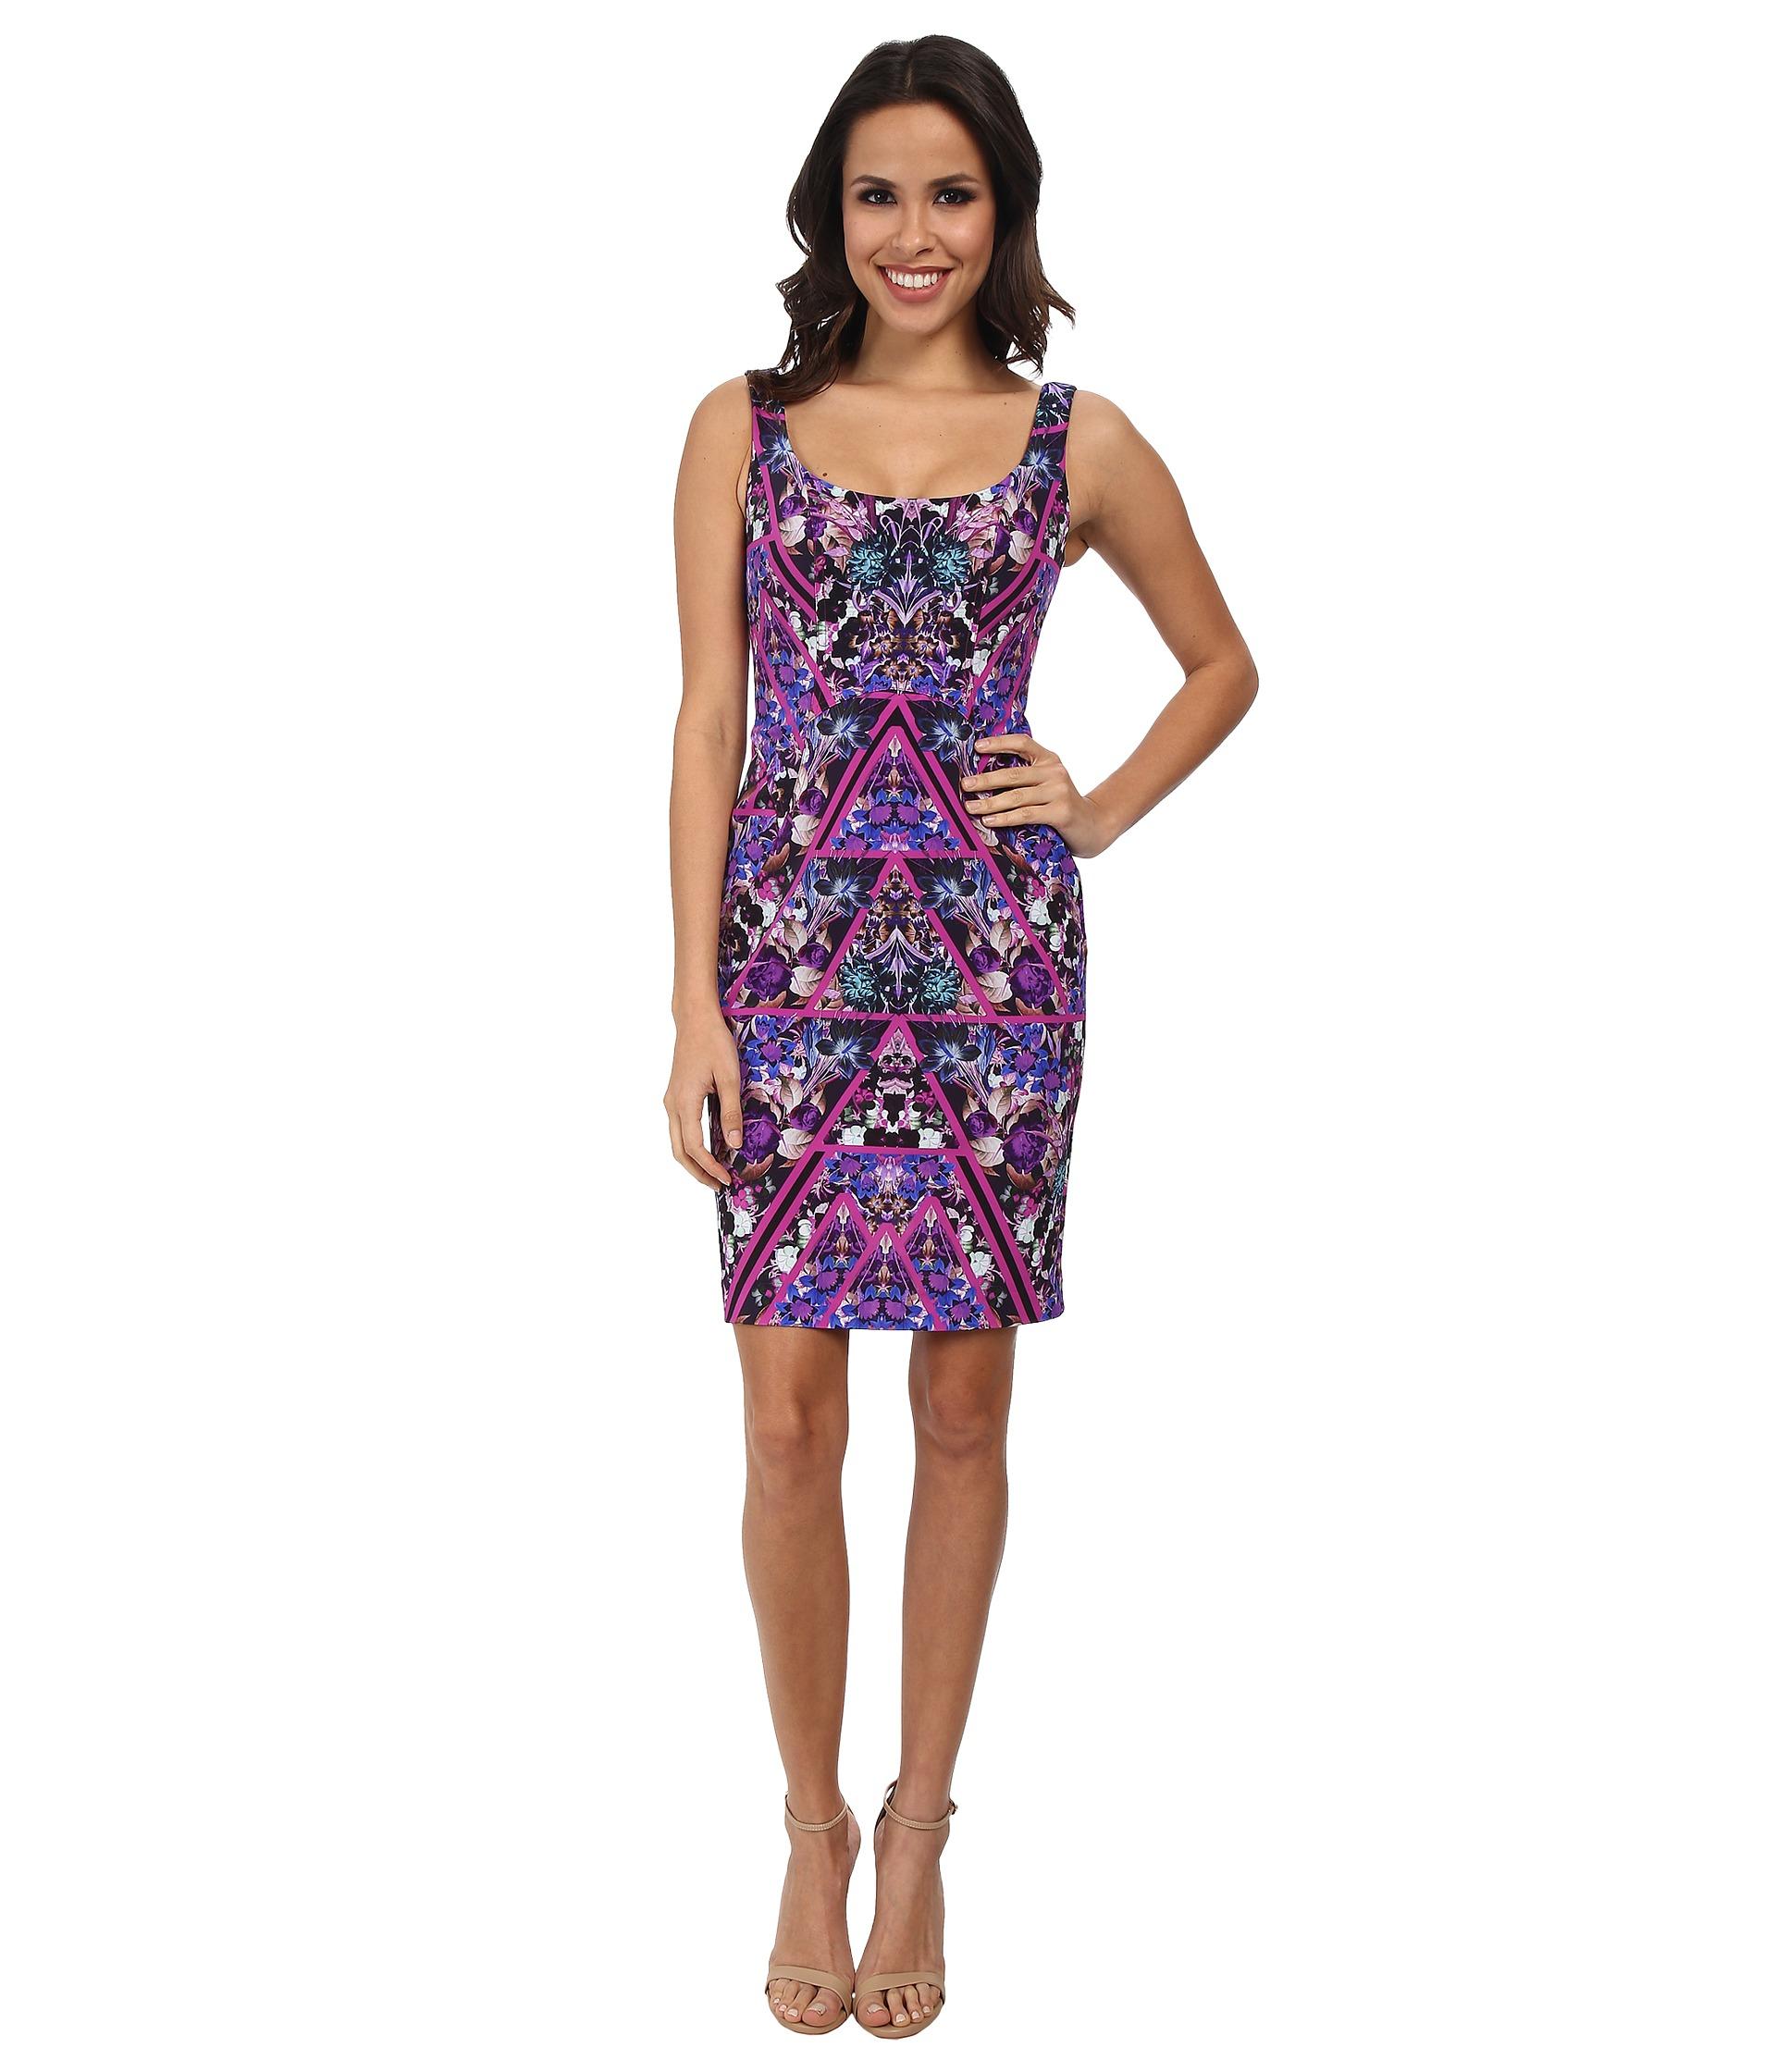 Lyst - Nicole Miller Berry Bliss Powernet Tank Dress e00284175